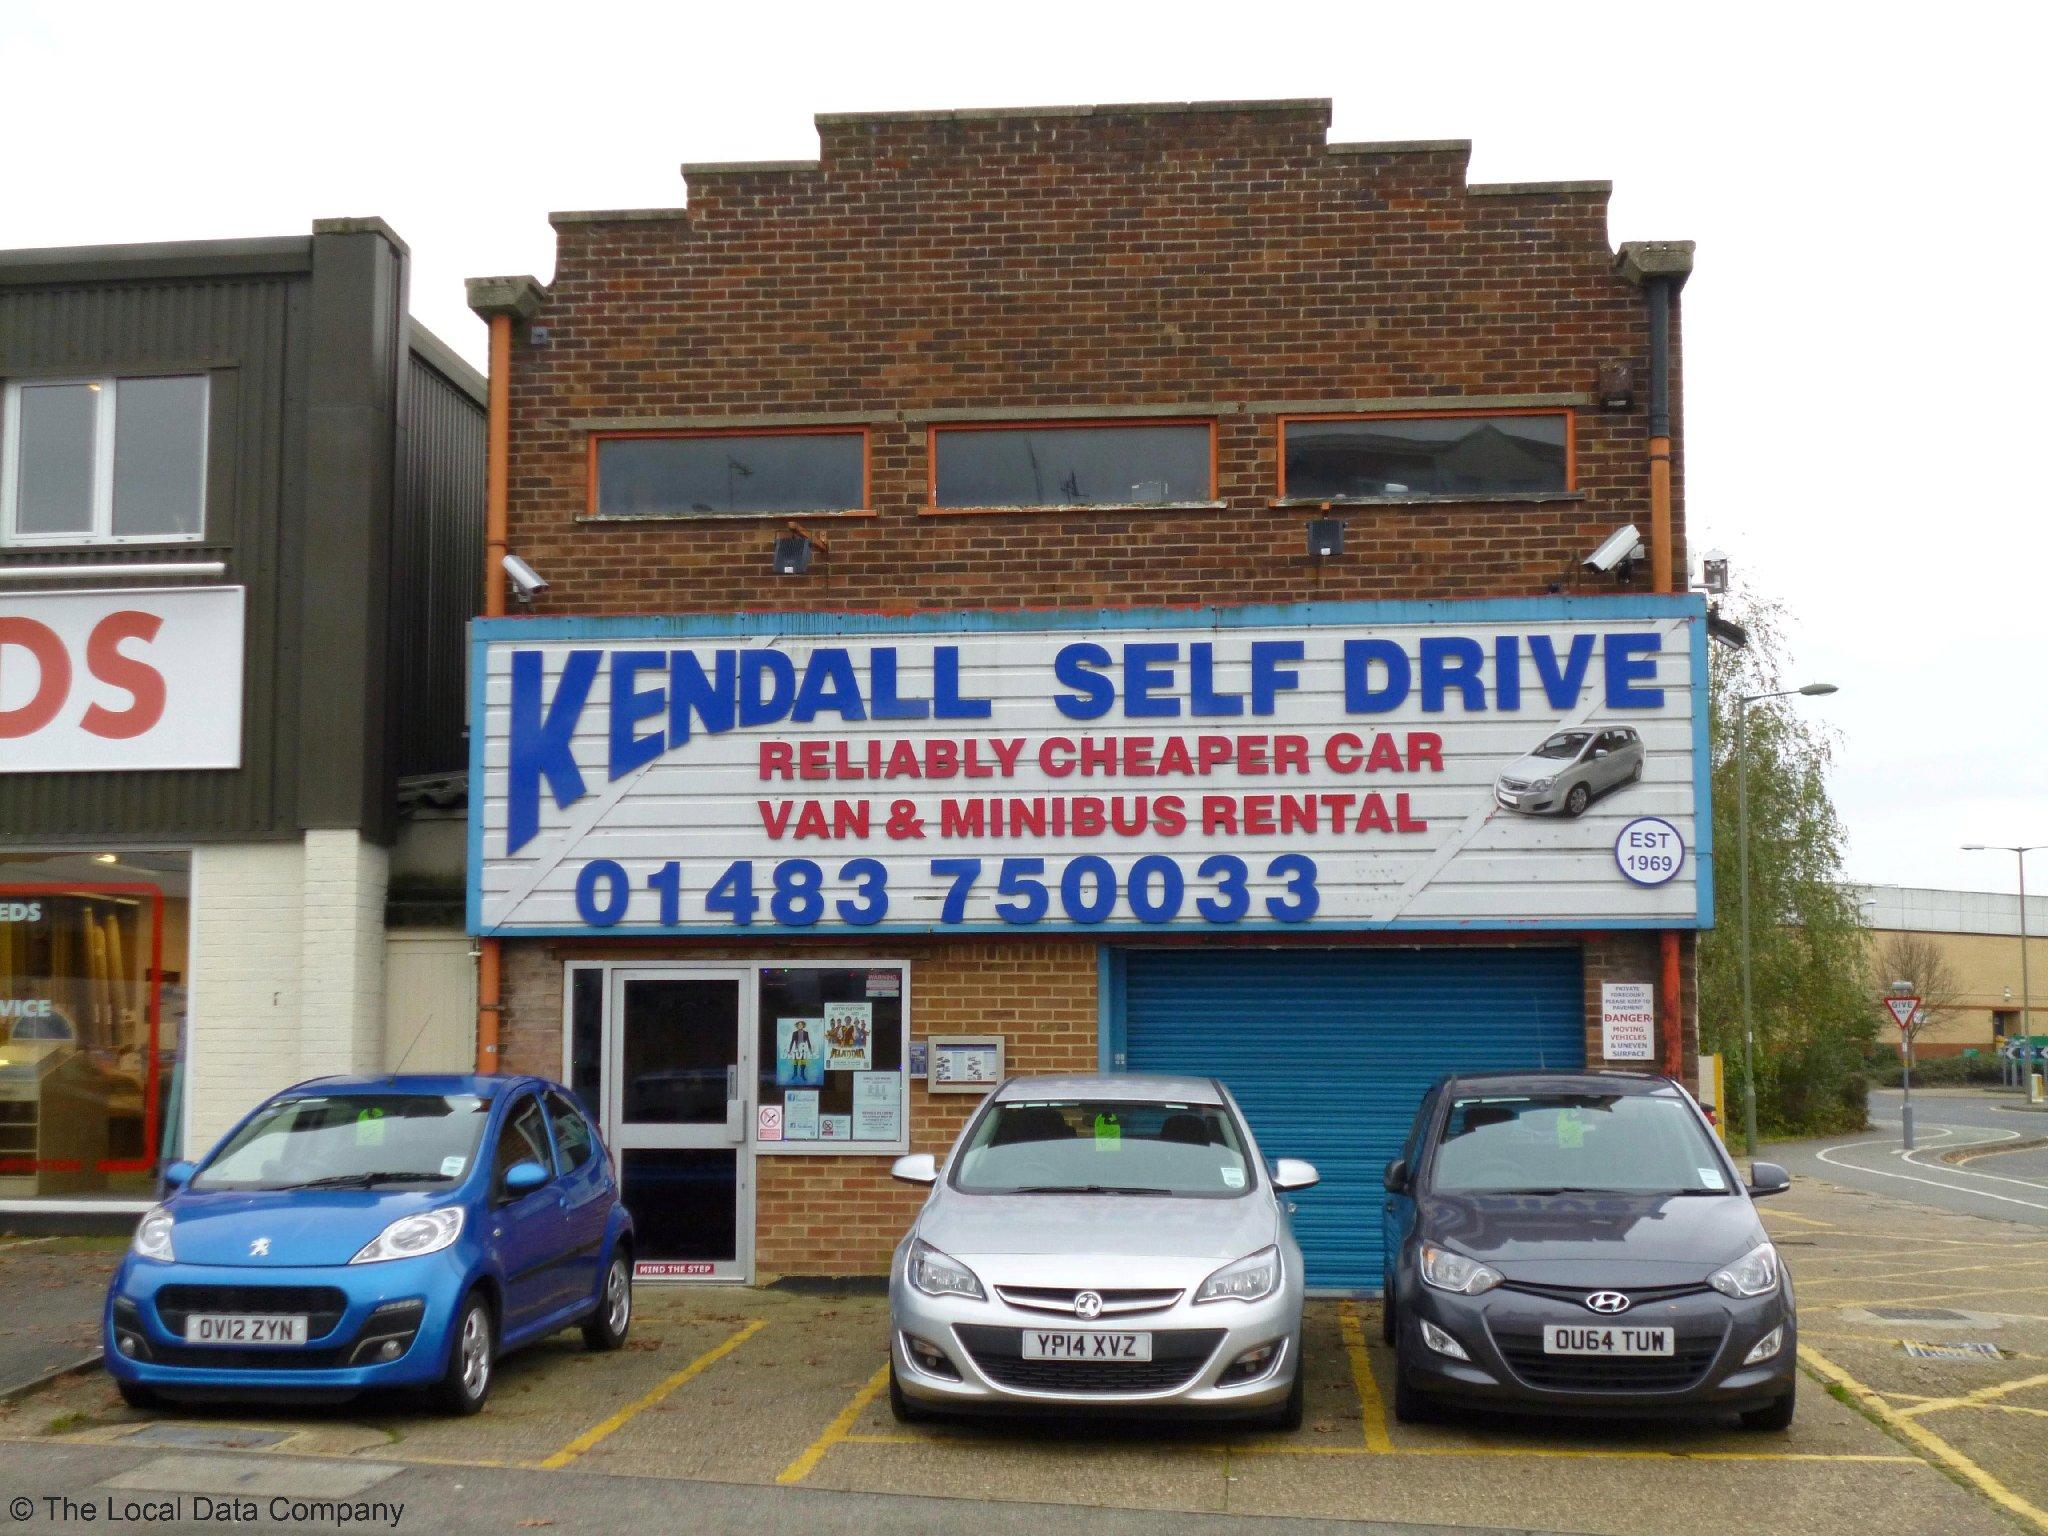 Kendall Car Rental Camberley